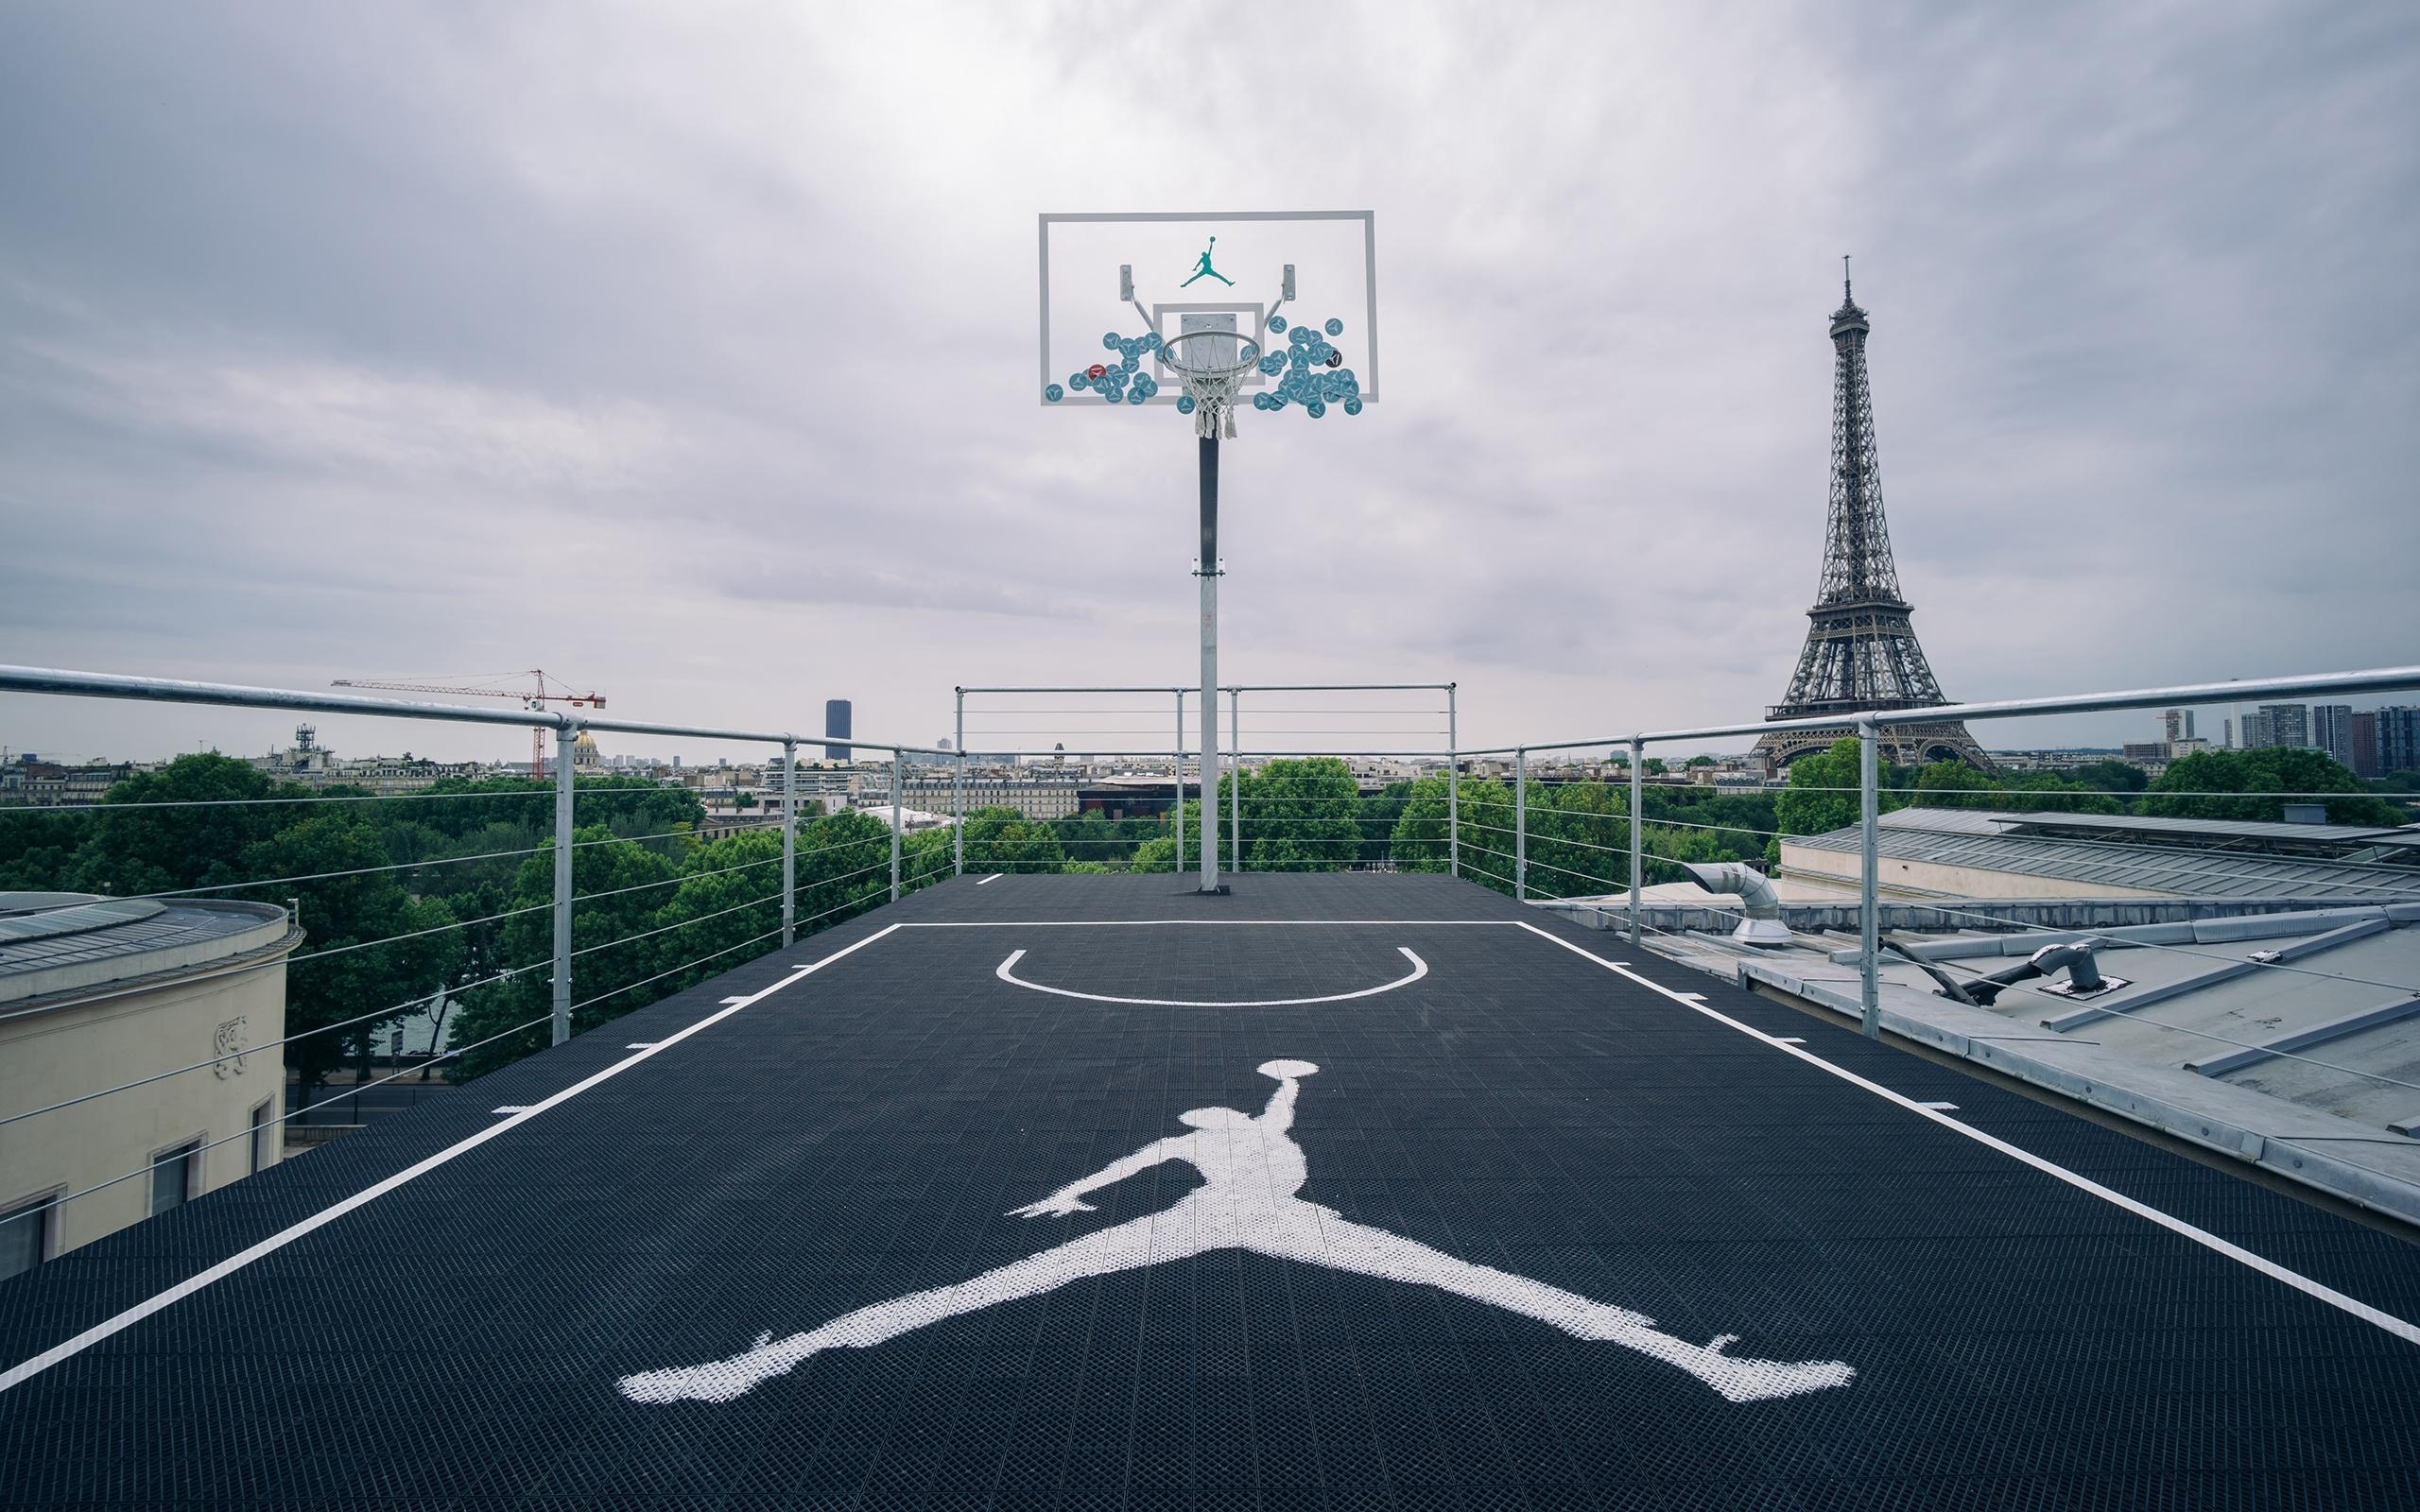 free download basketball court wallpaper. - media file | pixelstalk